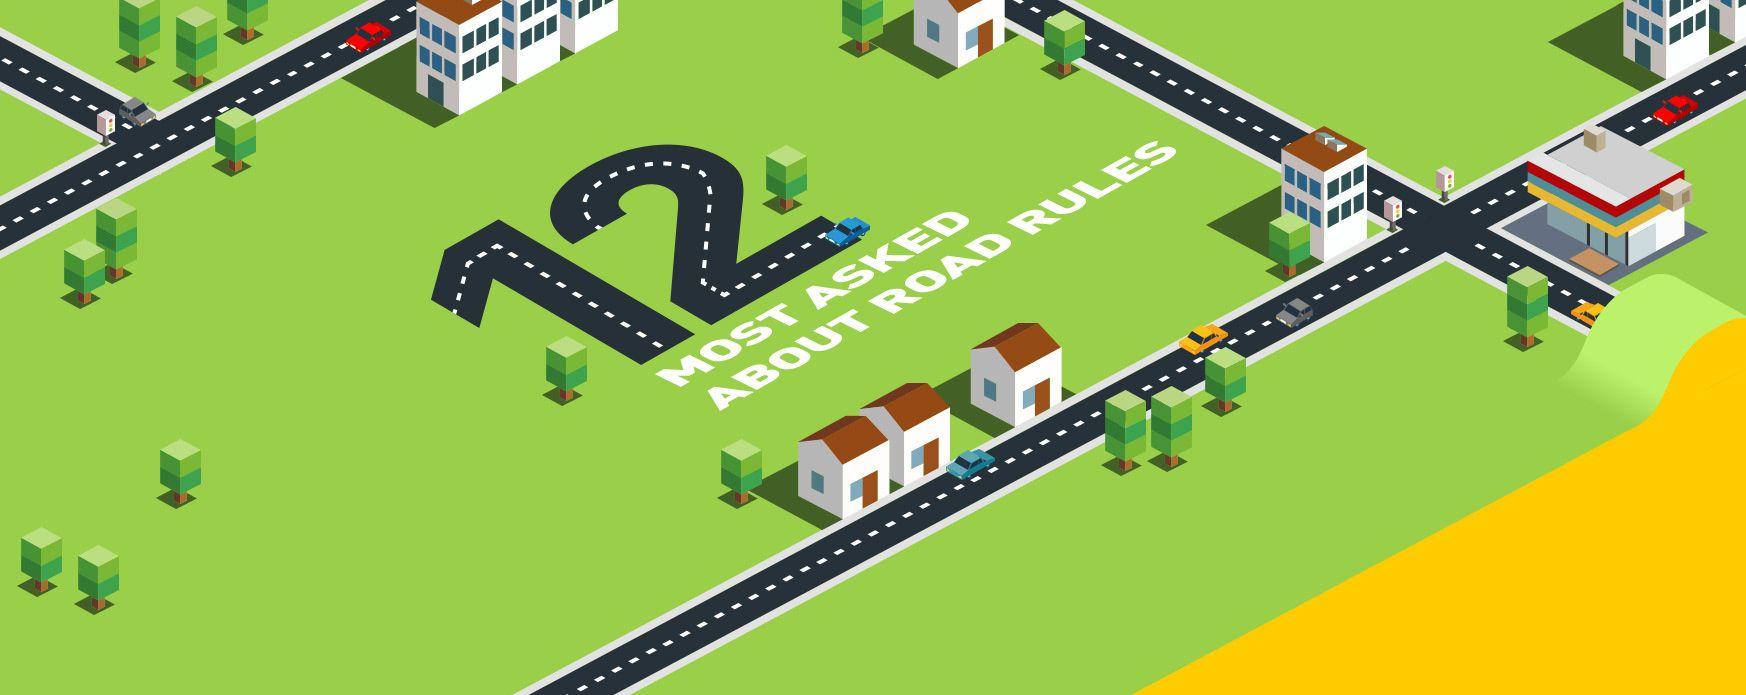 RSC Road rules website